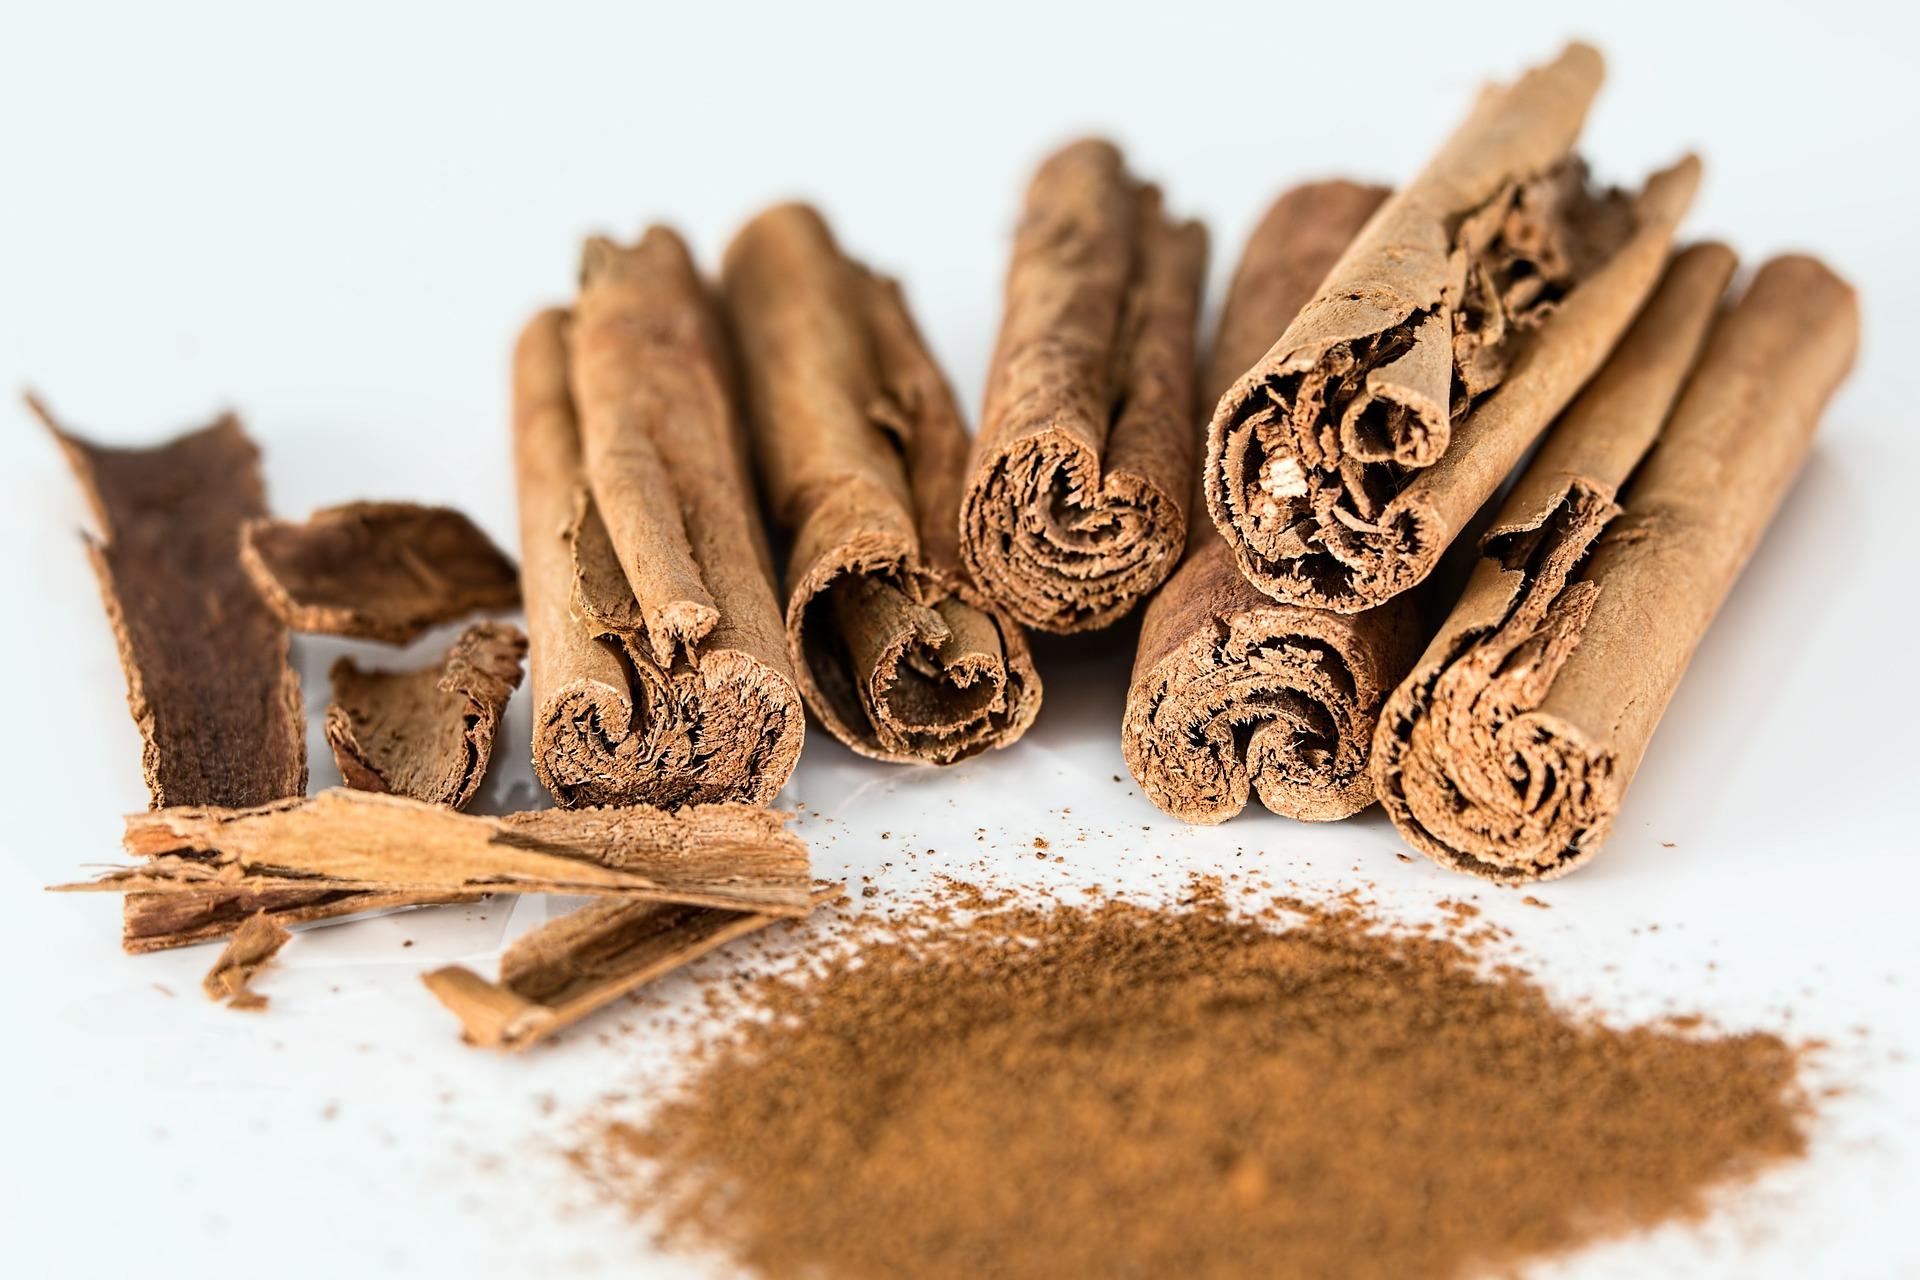 cinnamon sticks and ground cinnamon on isolated background